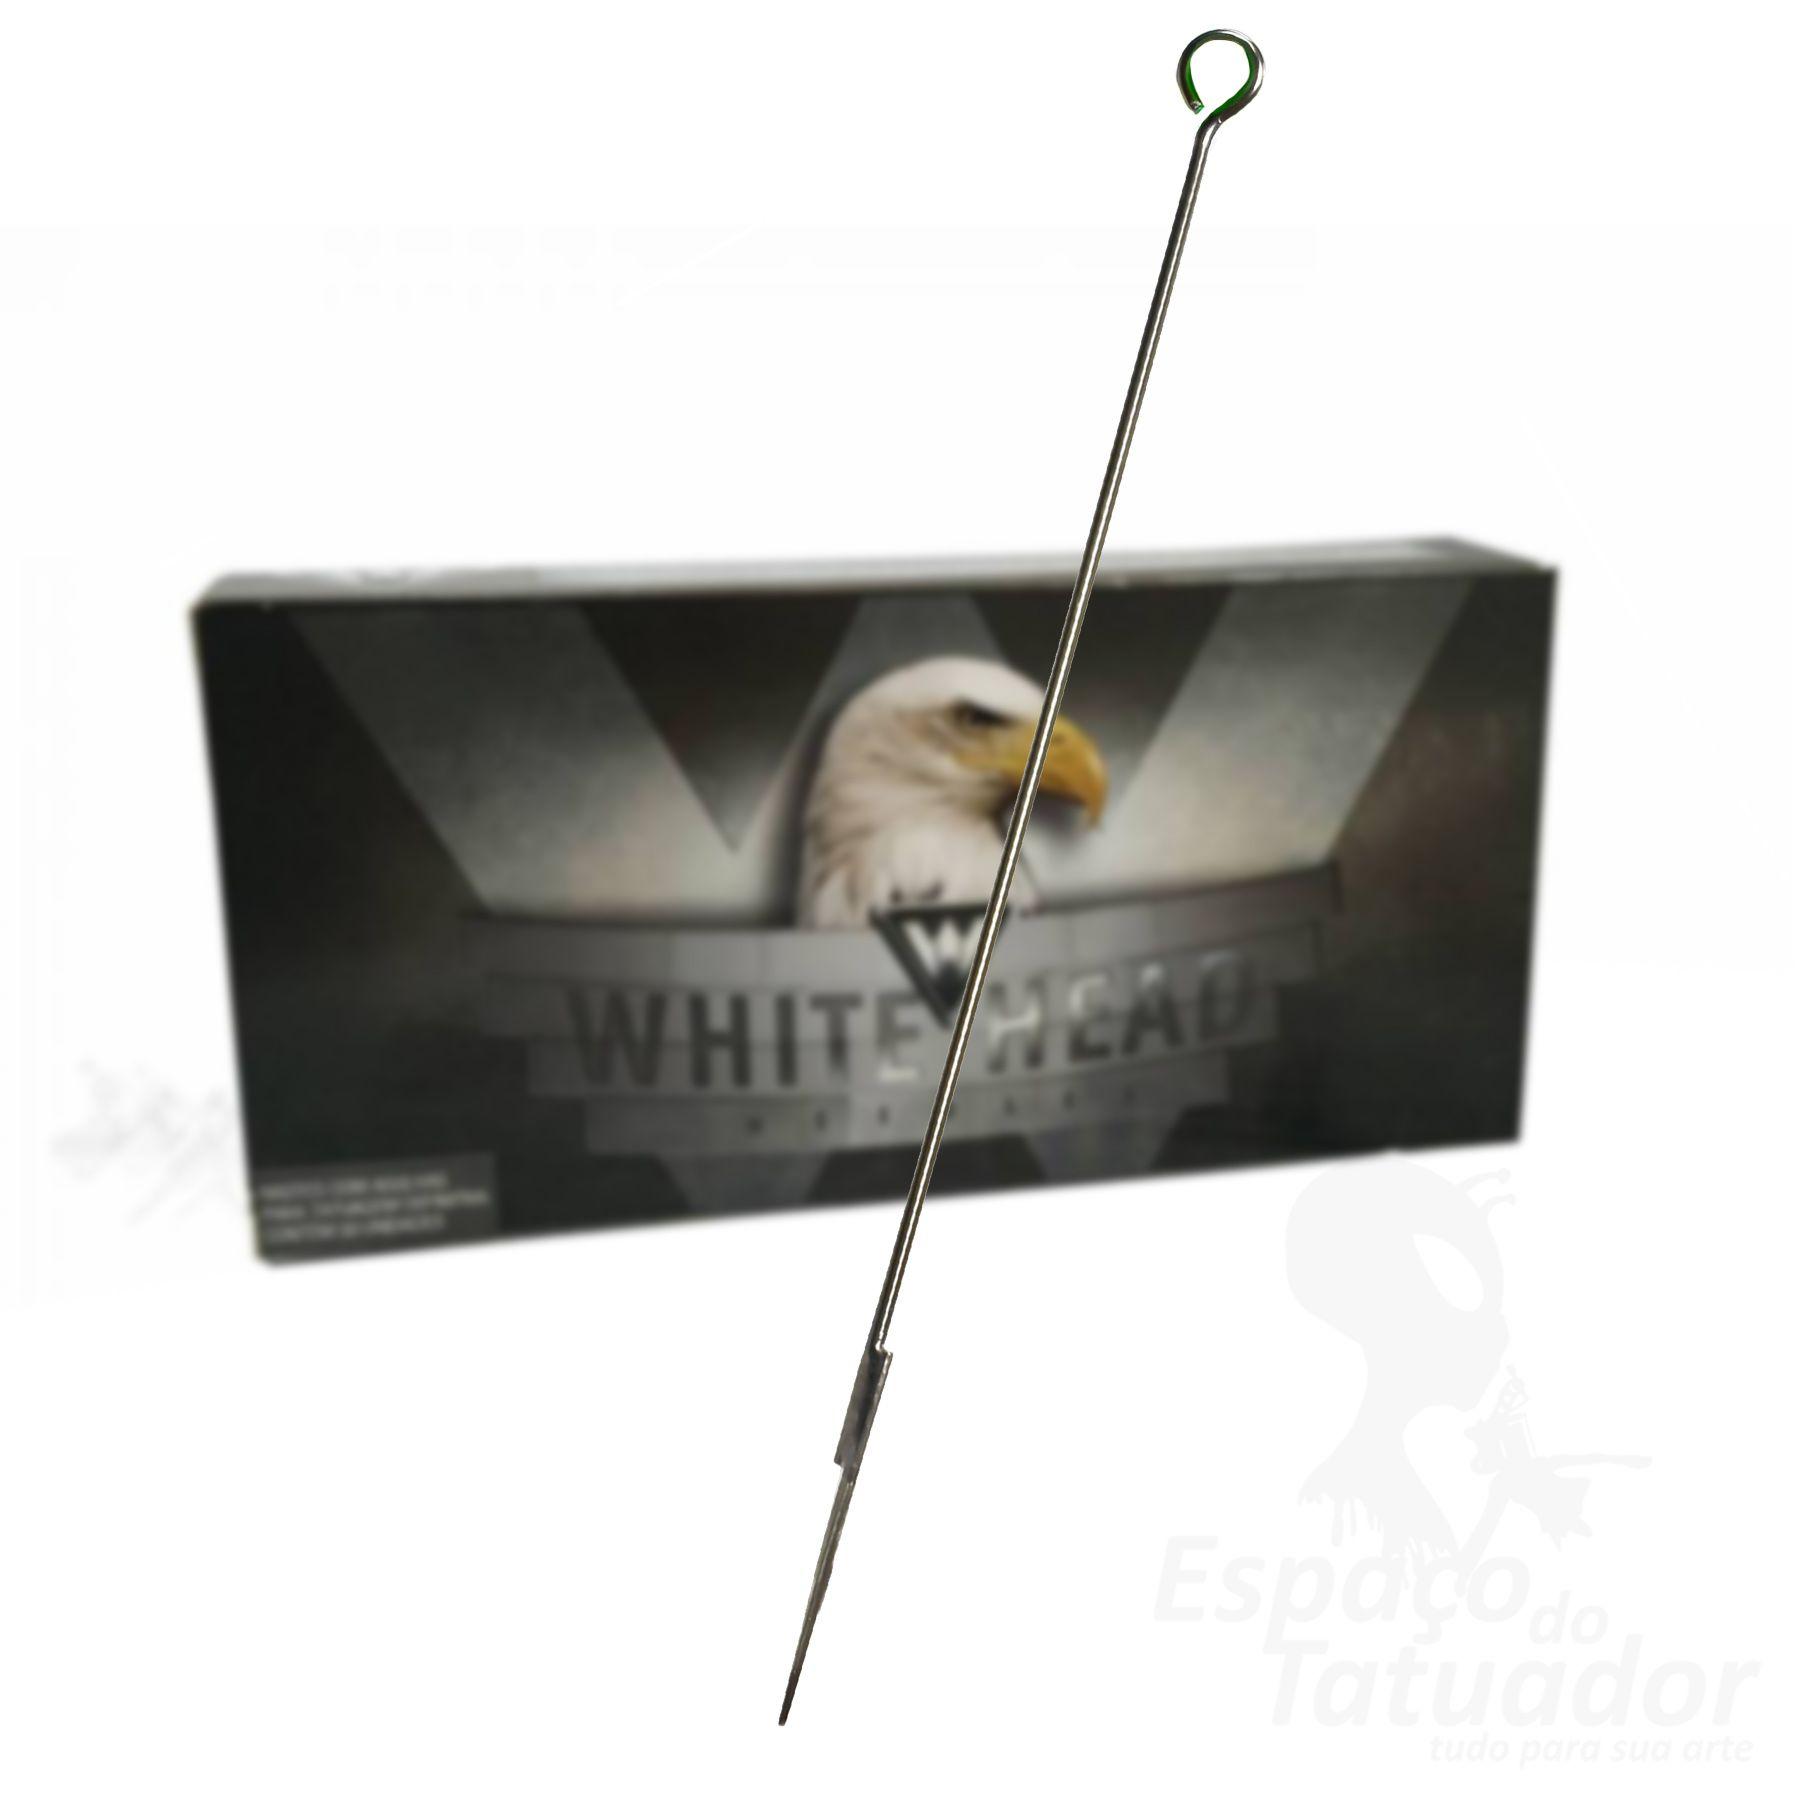 Agulha White Head - RL 1005 - Caixa com 50 unidades